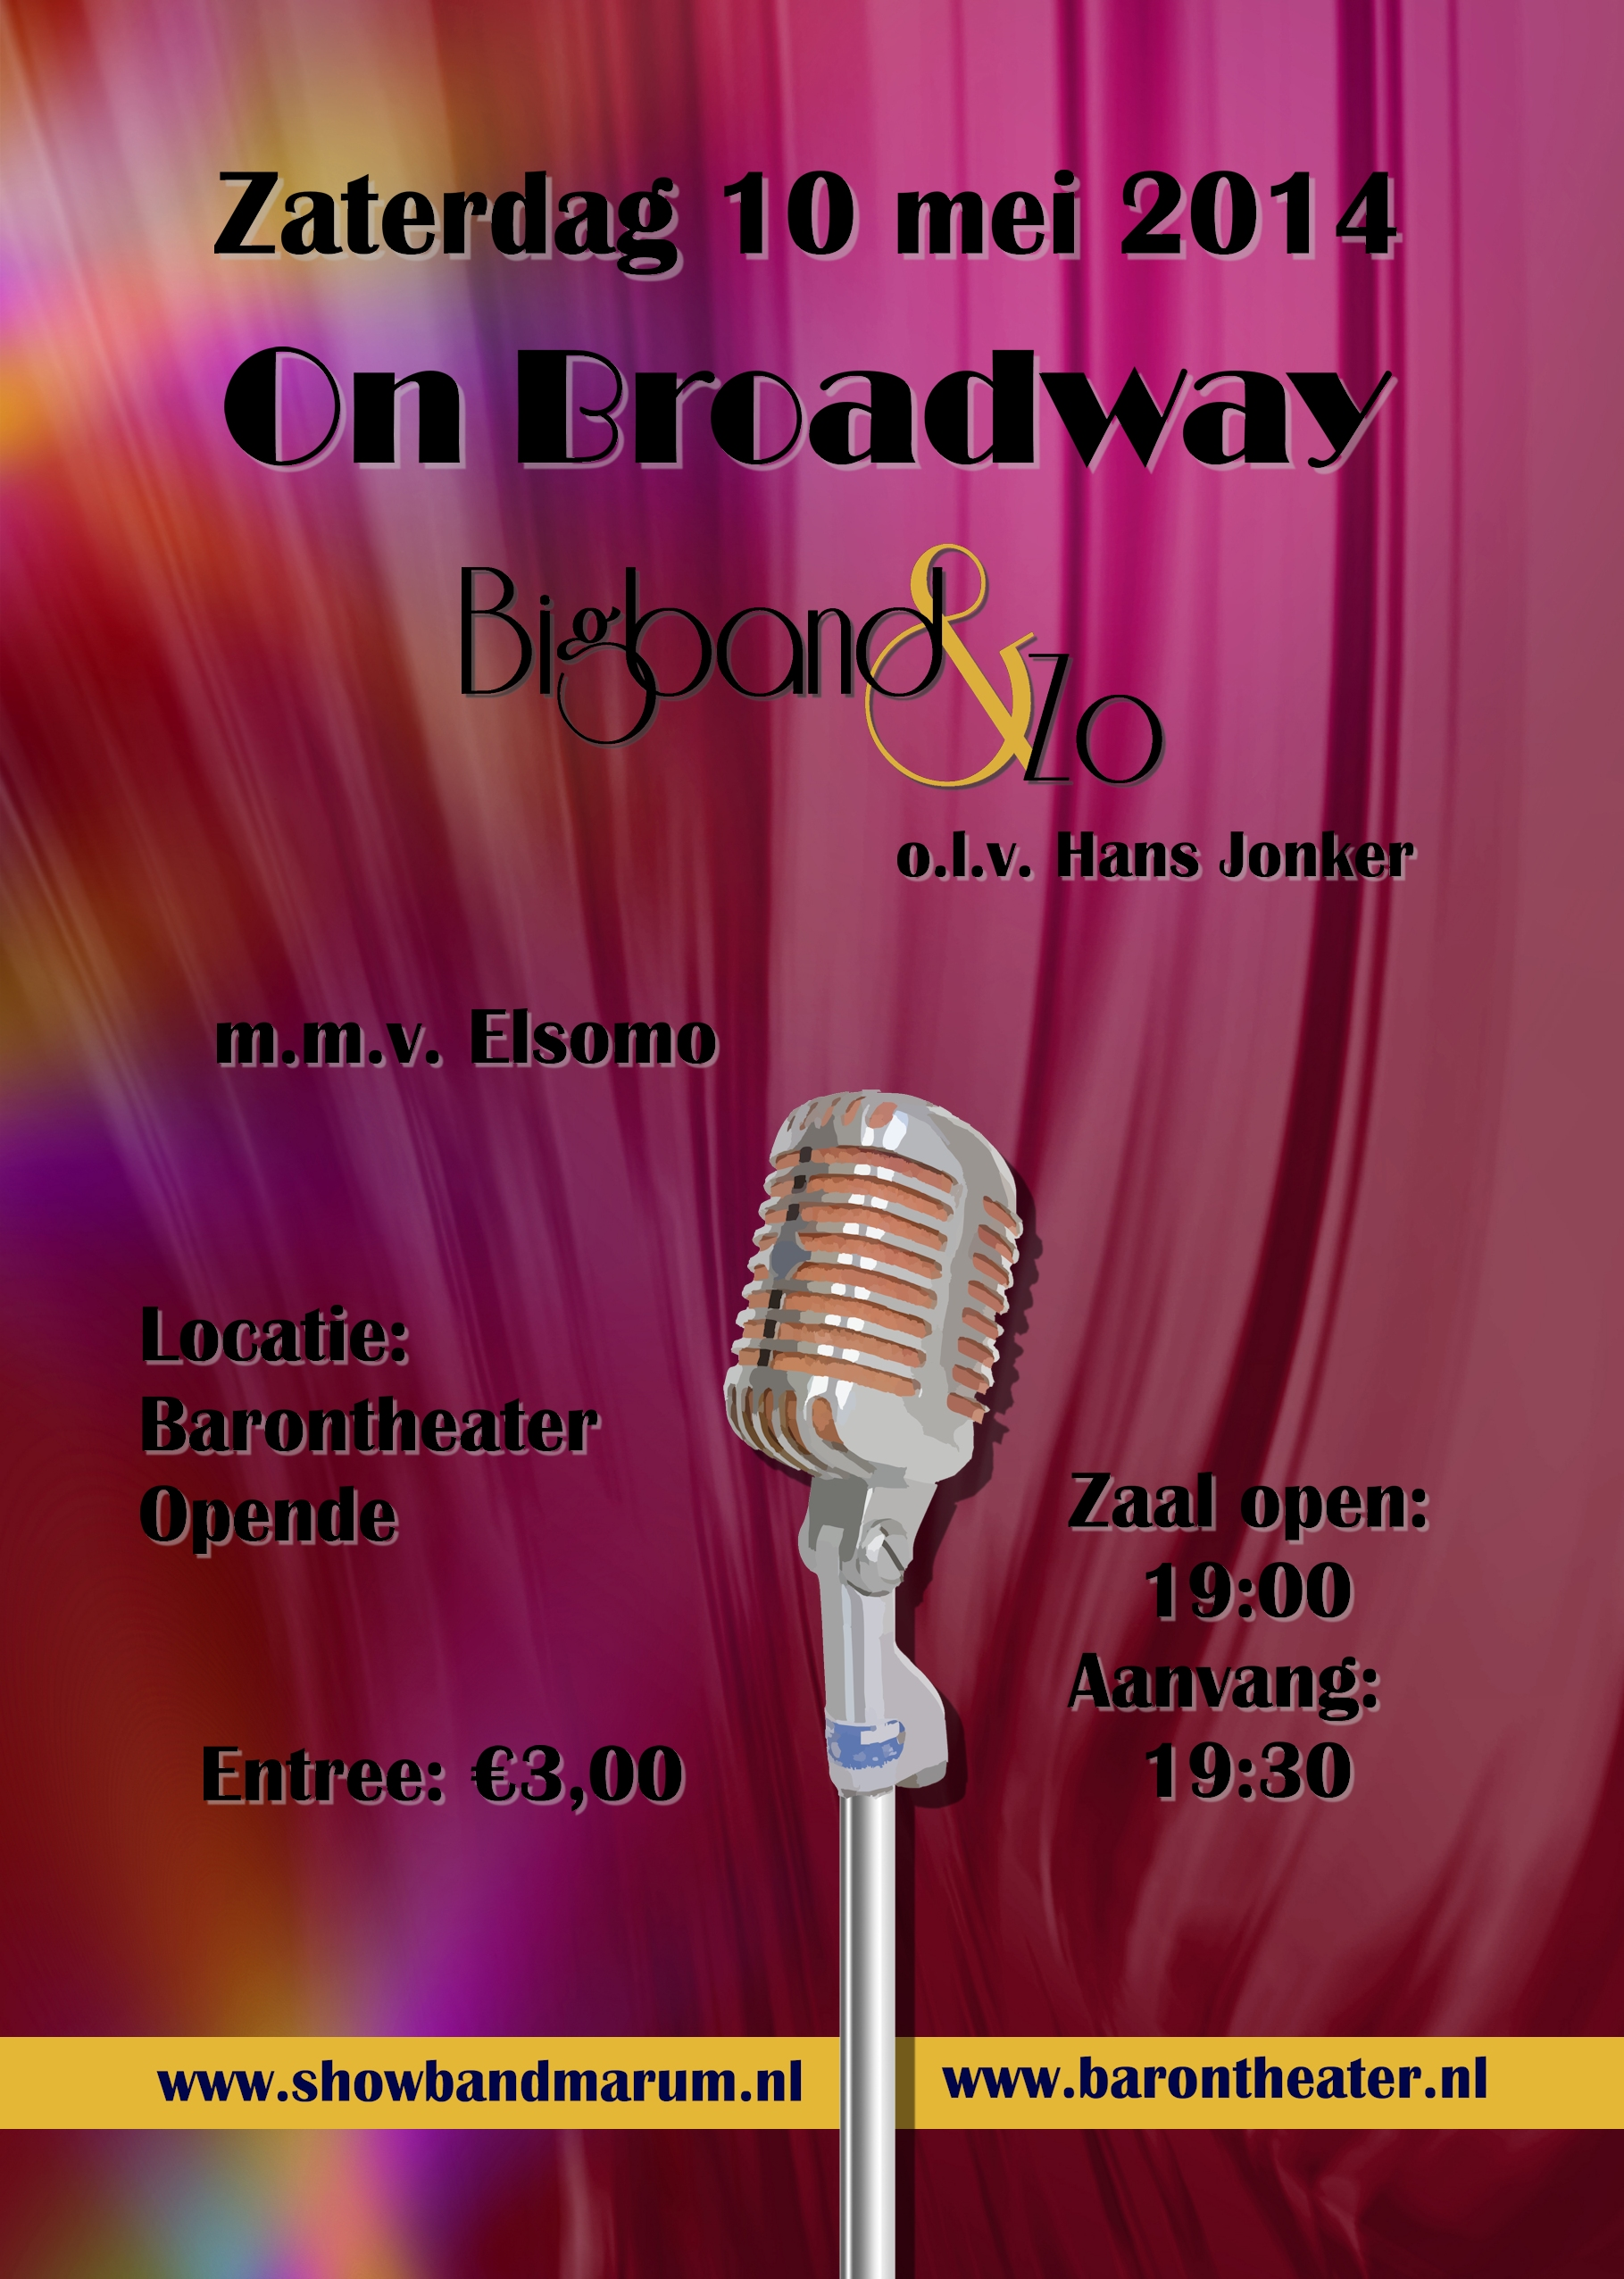 Flyer On Broadway Bigband & Zo